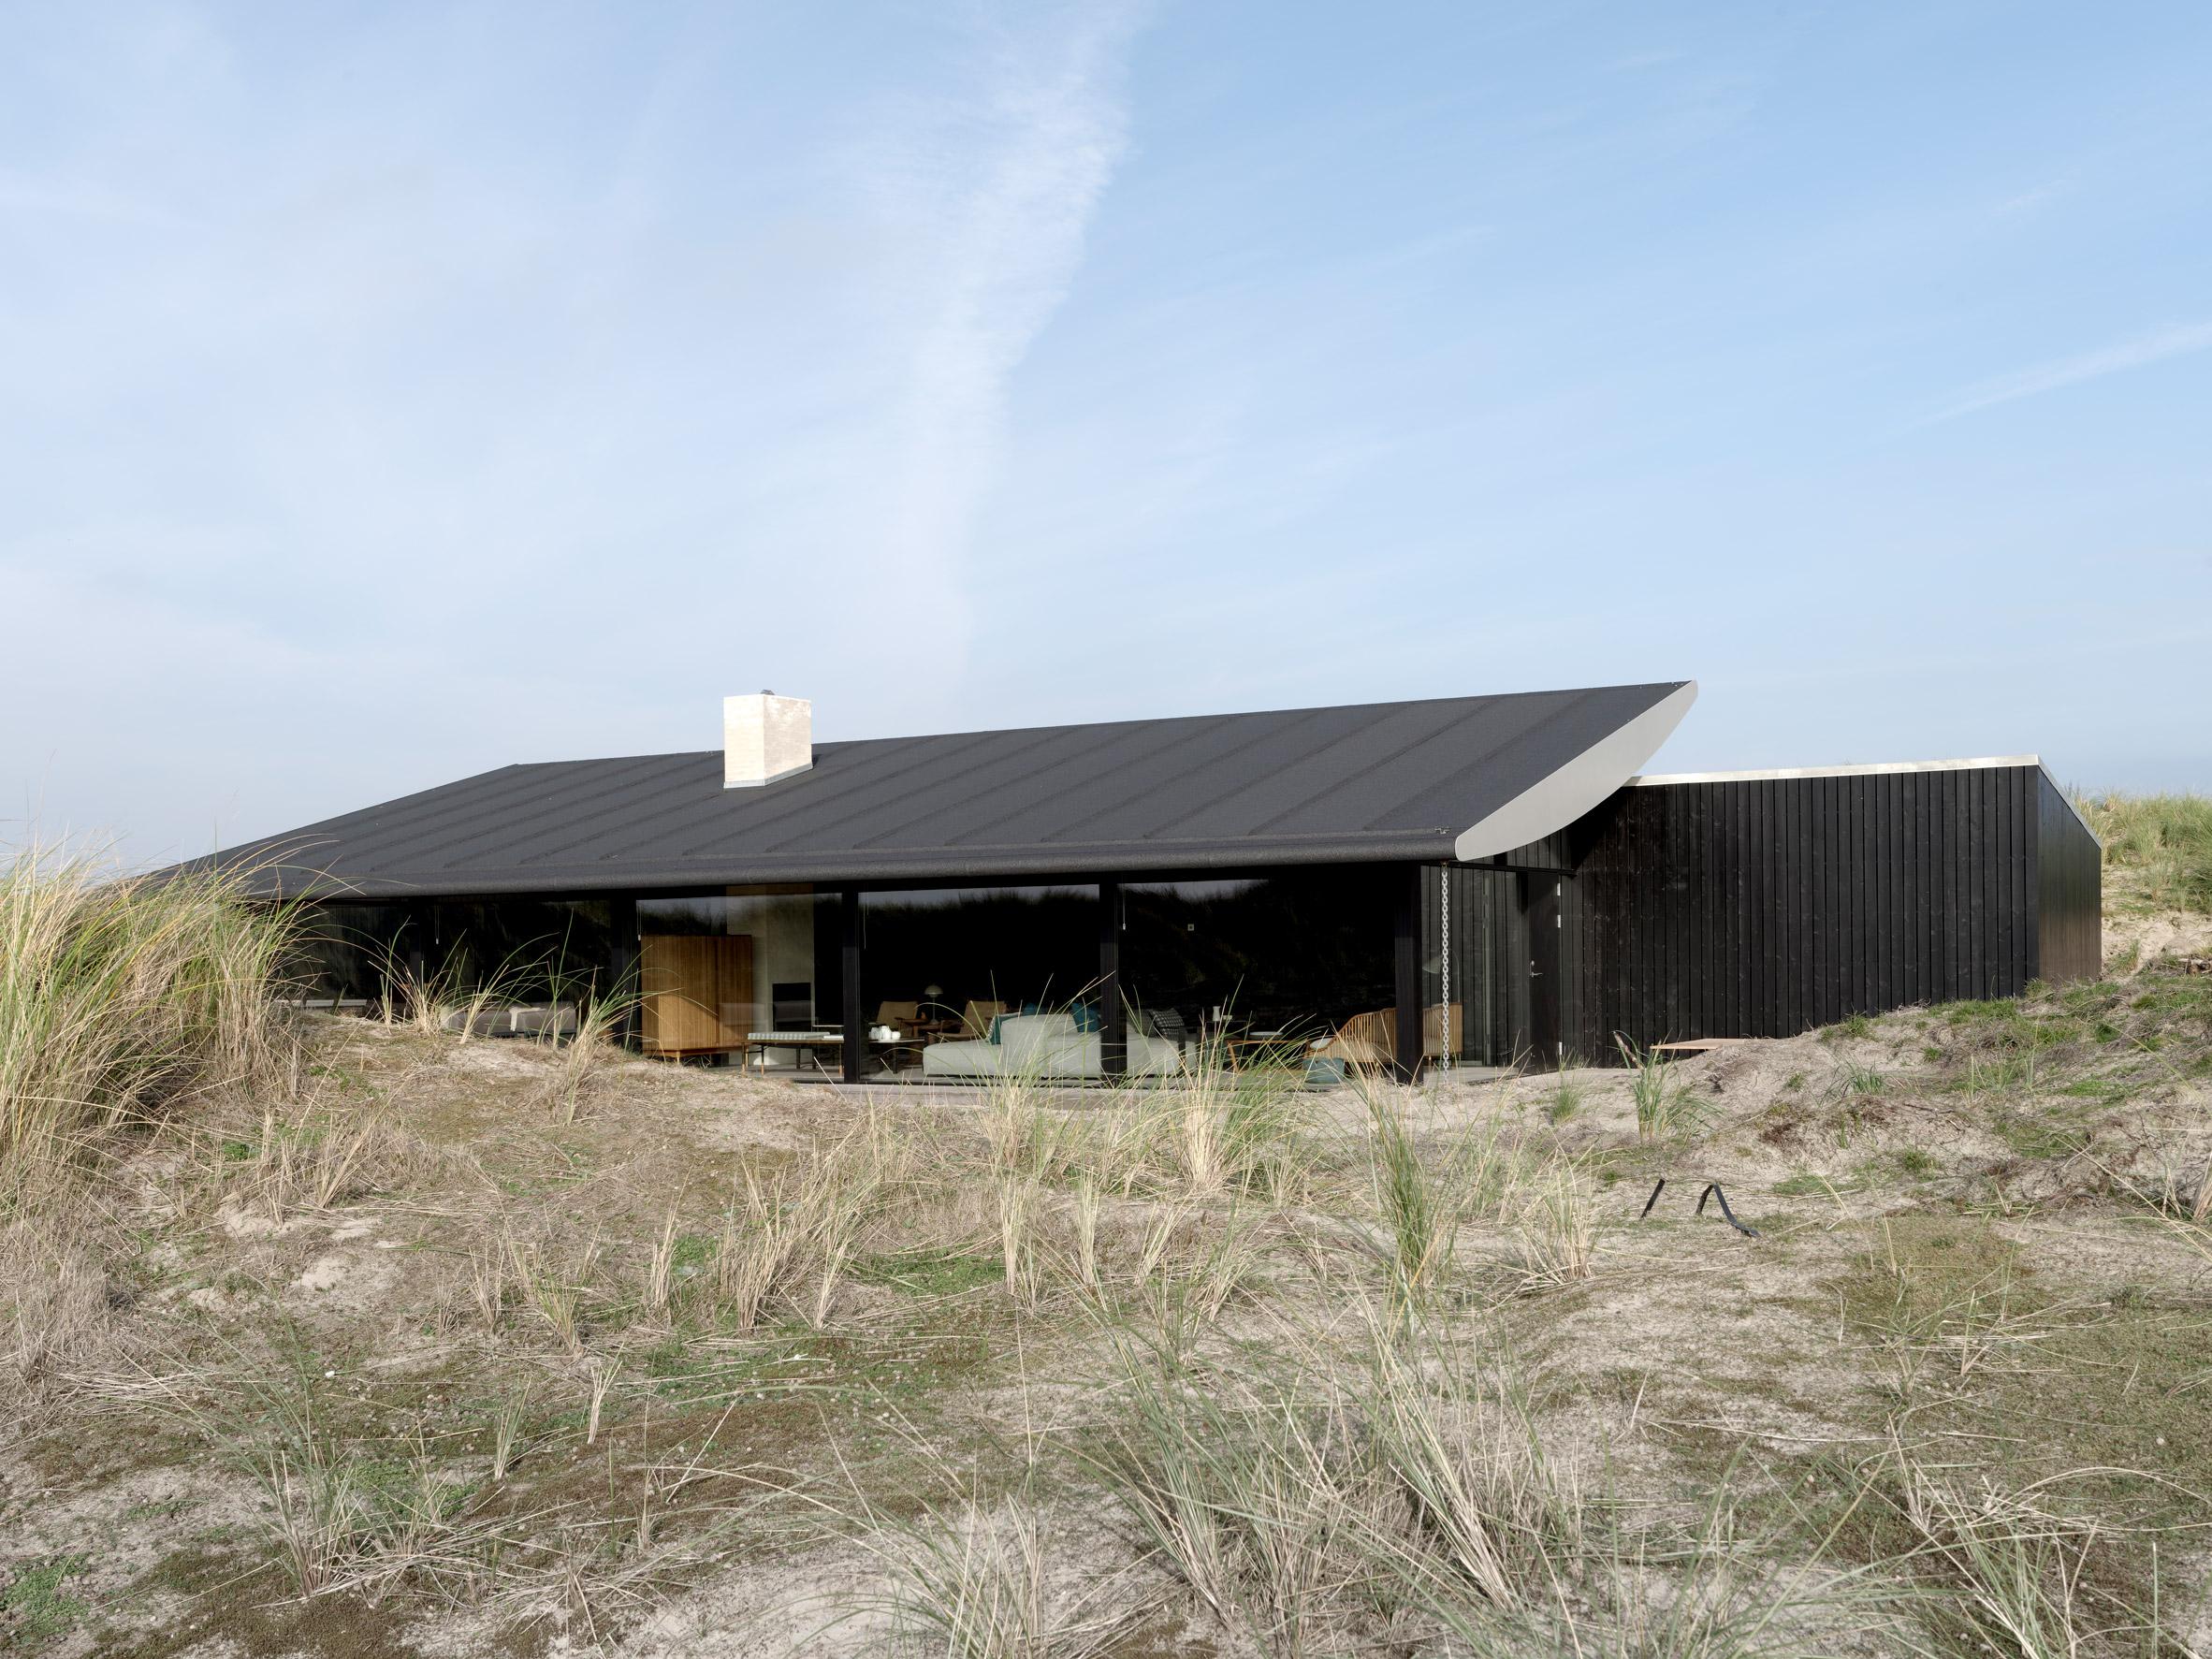 fano-house-knud-holscher-architecture-residential-denmark_dezeen_2364_col_22 (1).jpg